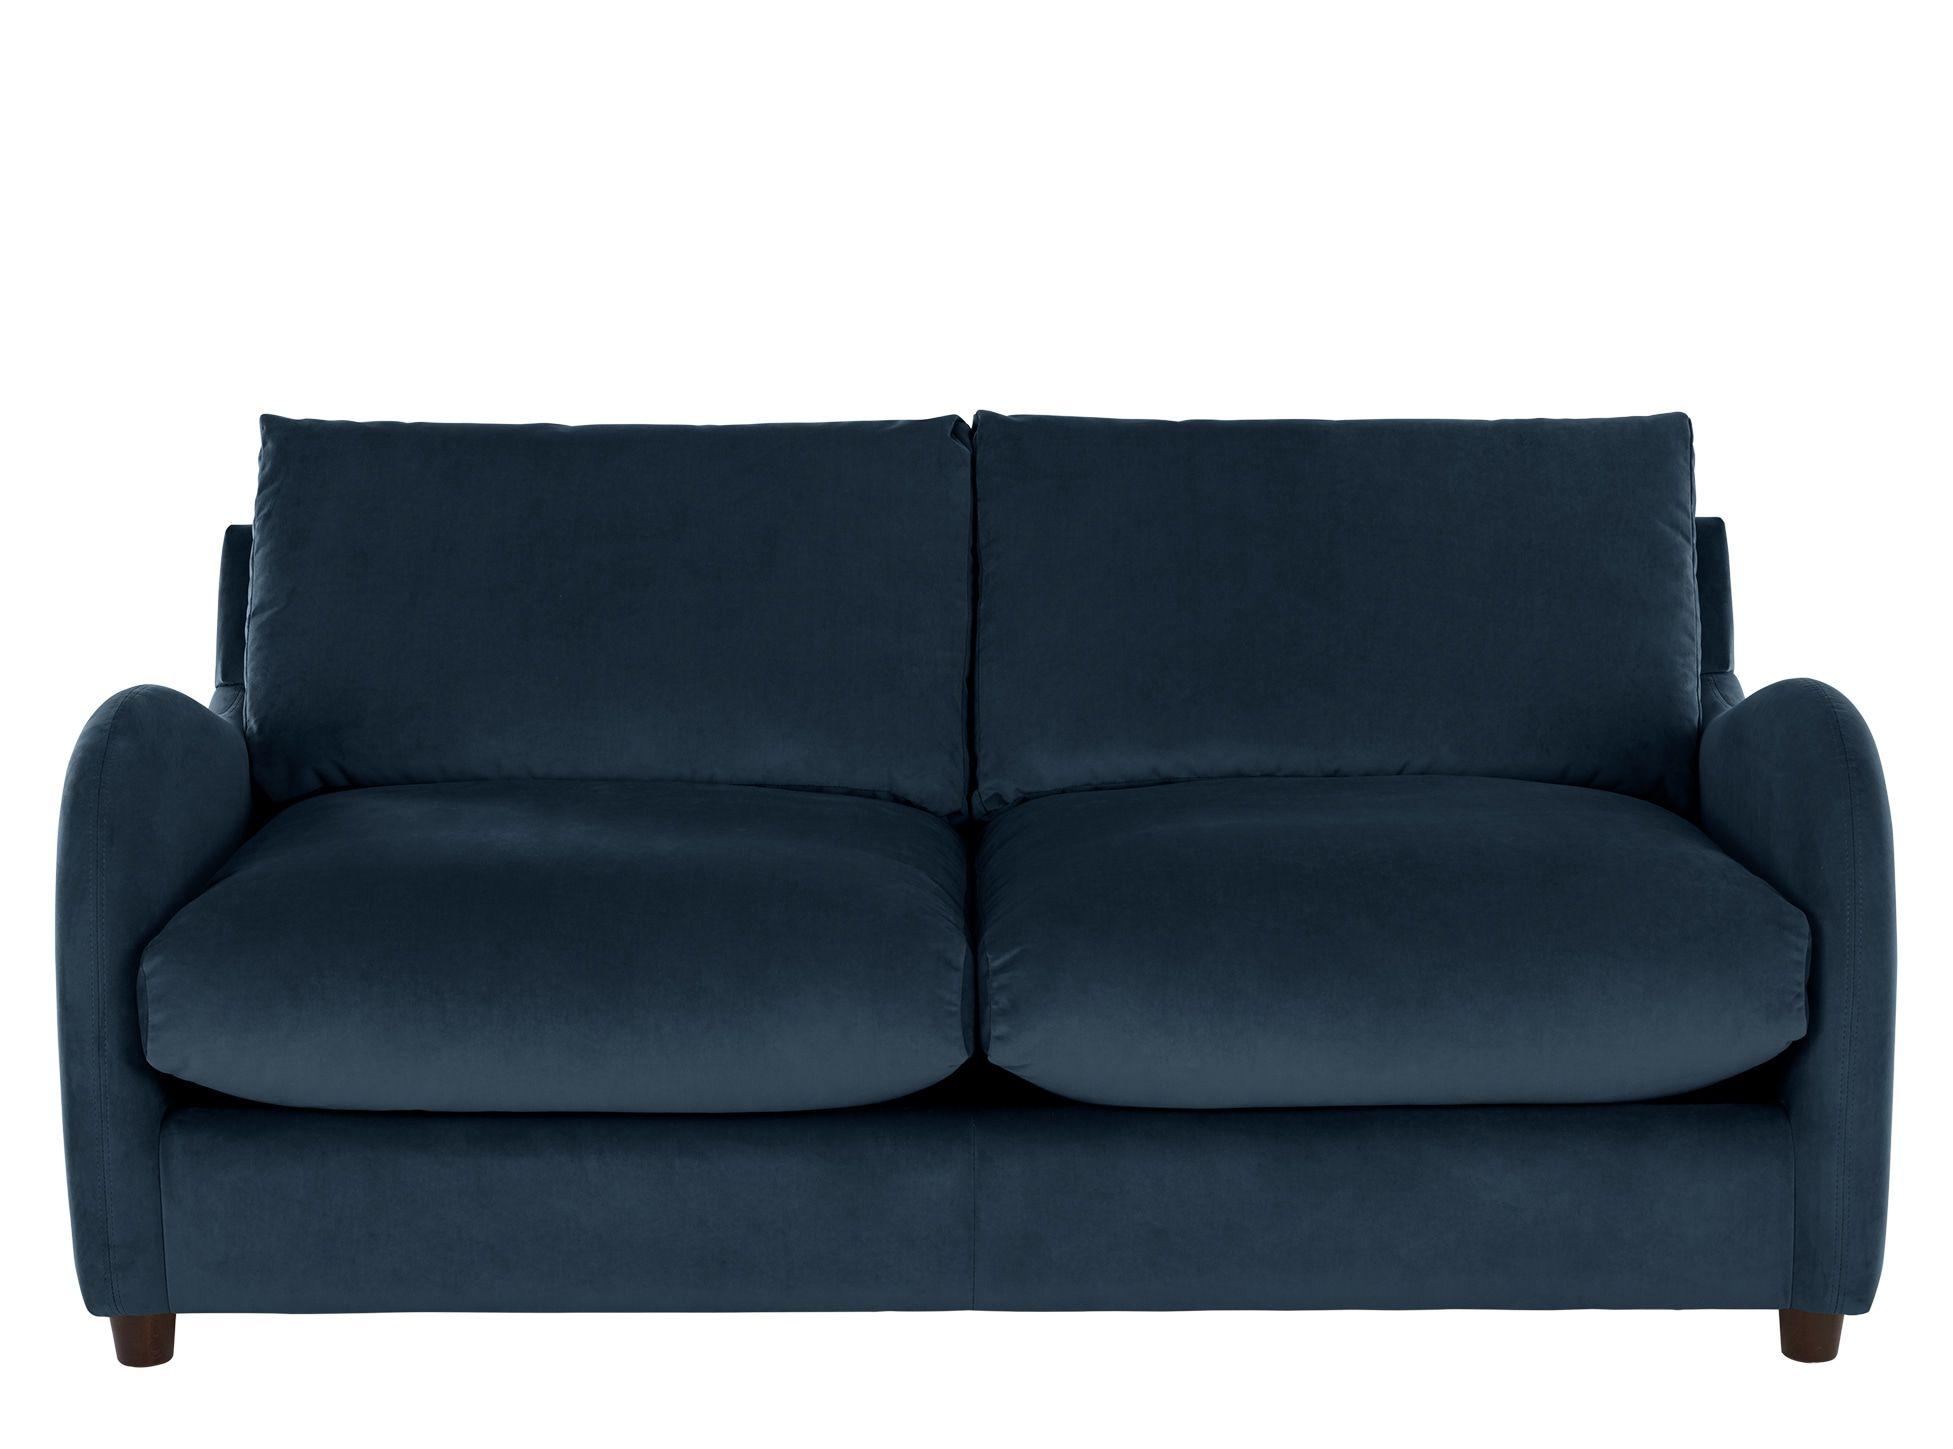 Sofia 2 Seater Sofabed Plush Indigo Velvet Zolder Huis Sofa S